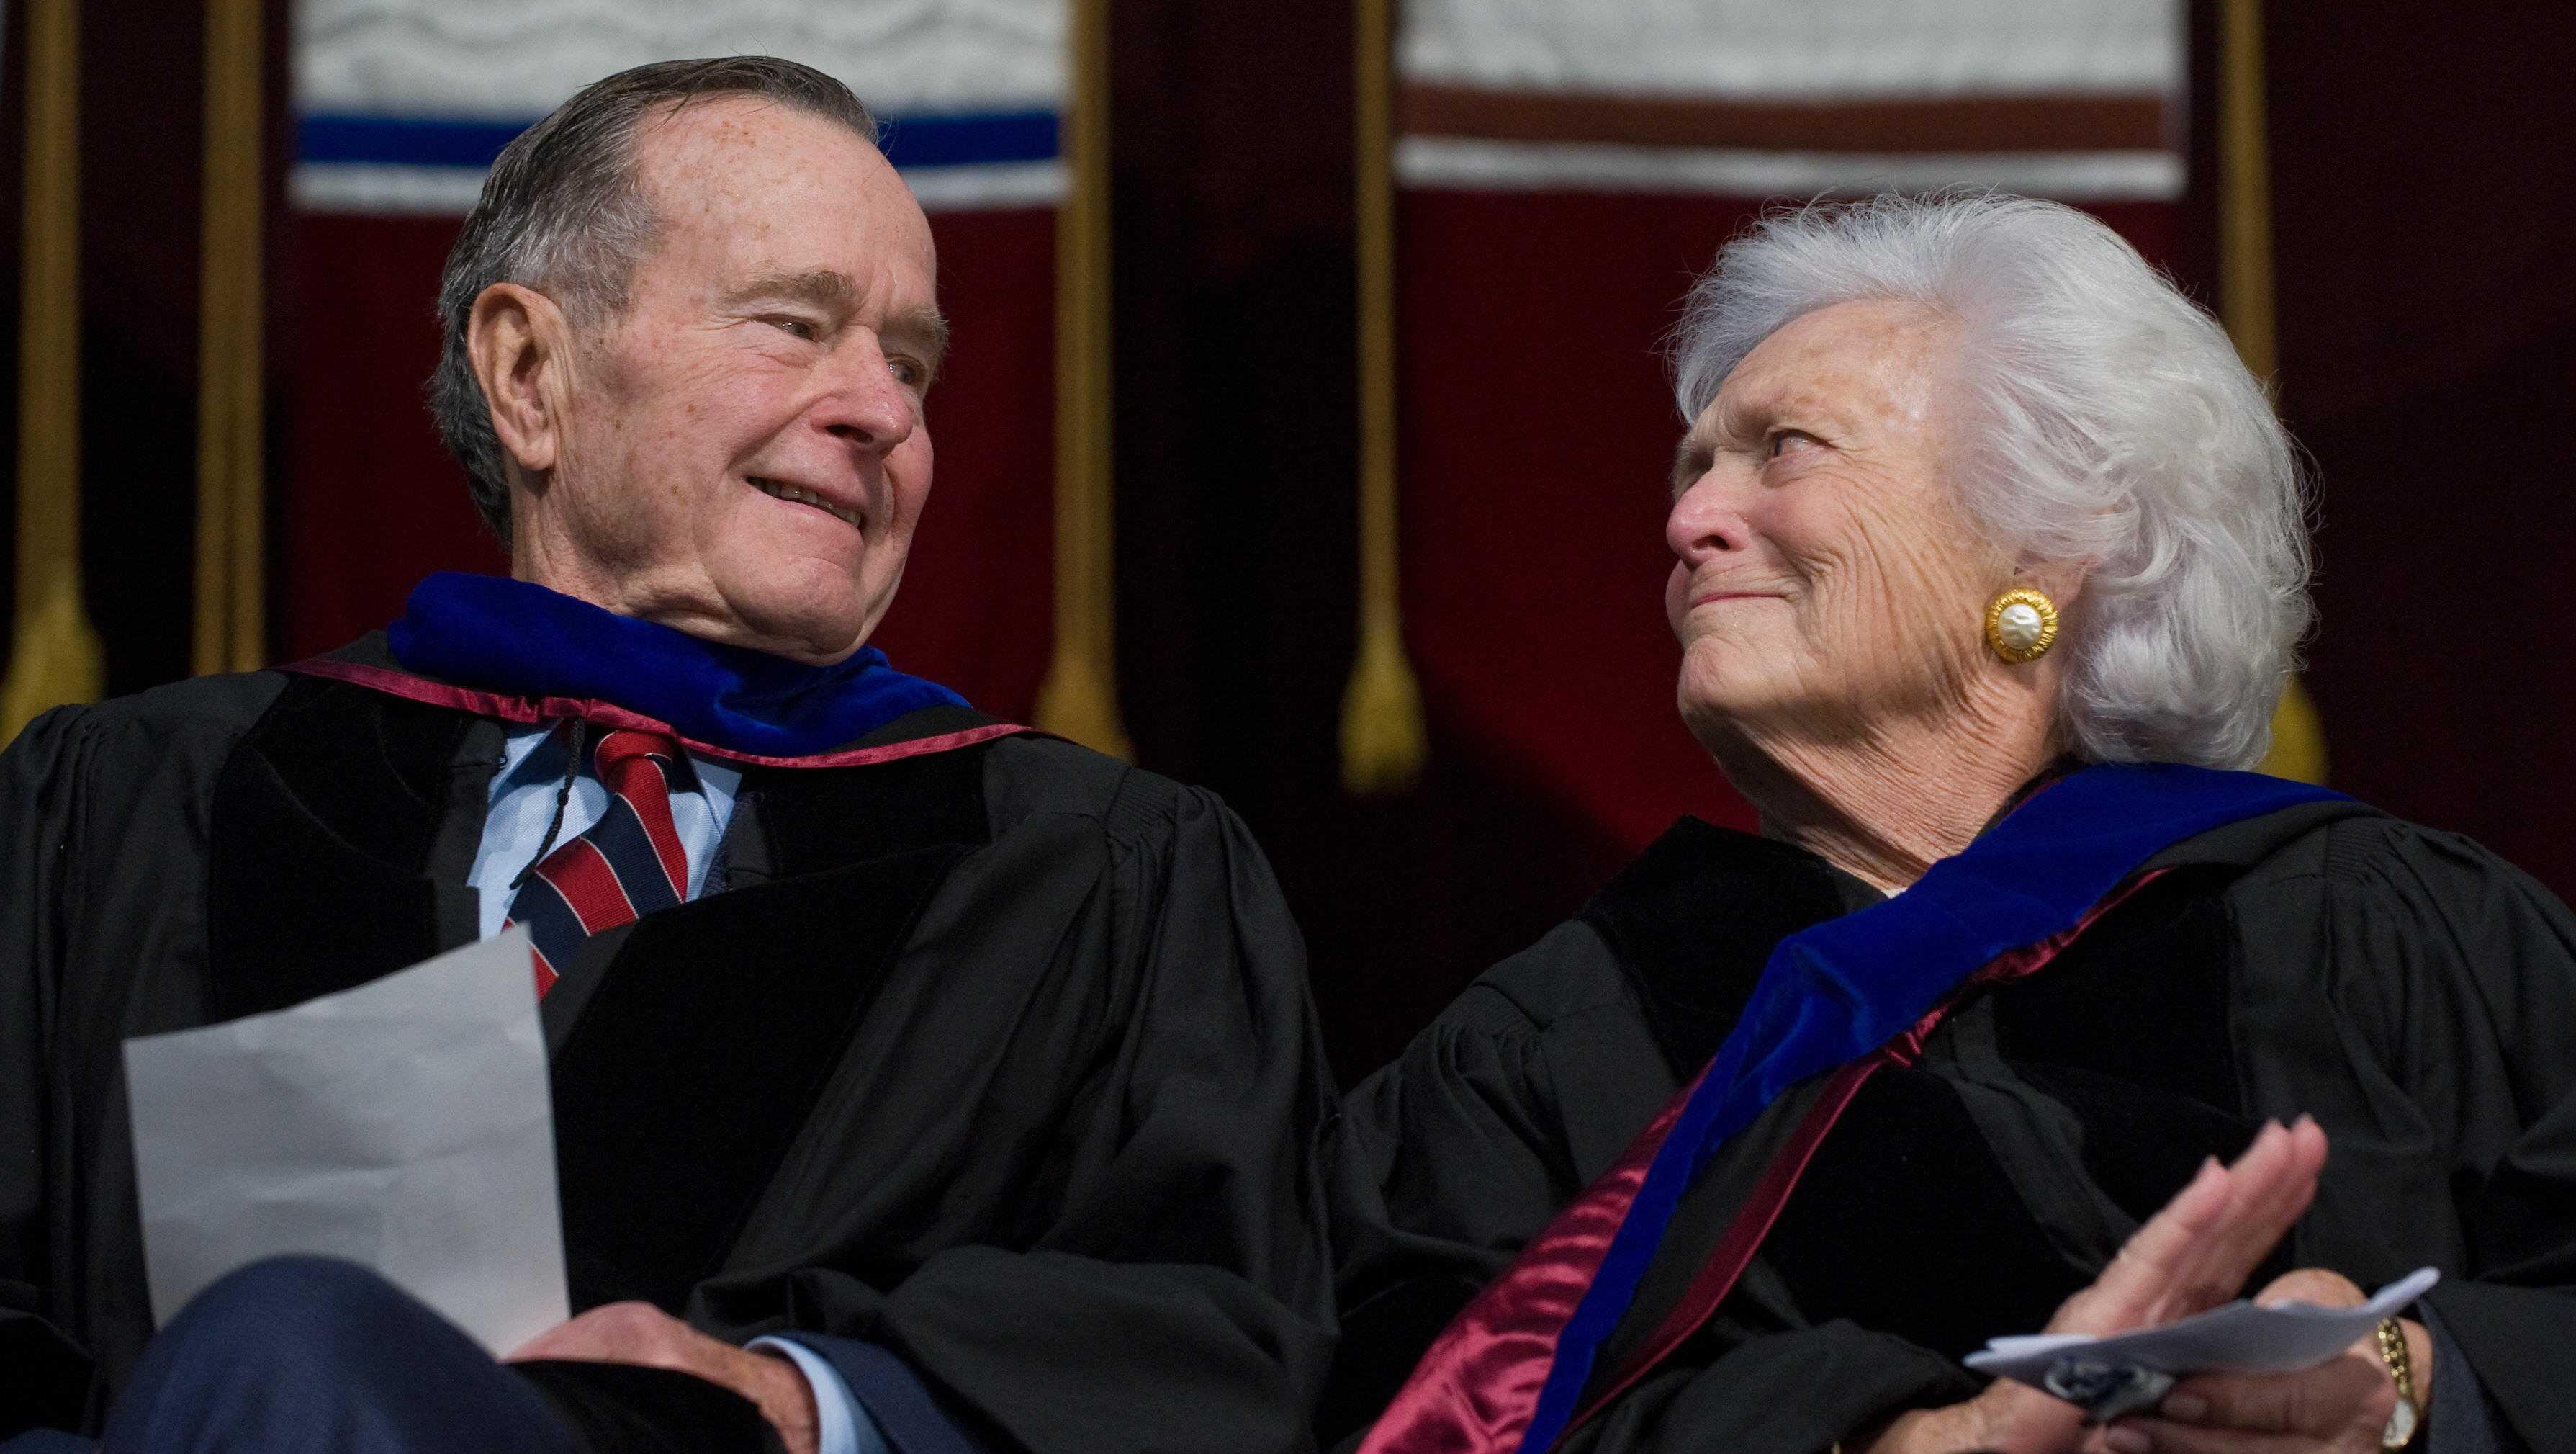 Barbara Bush and George H.W. Bush 2008